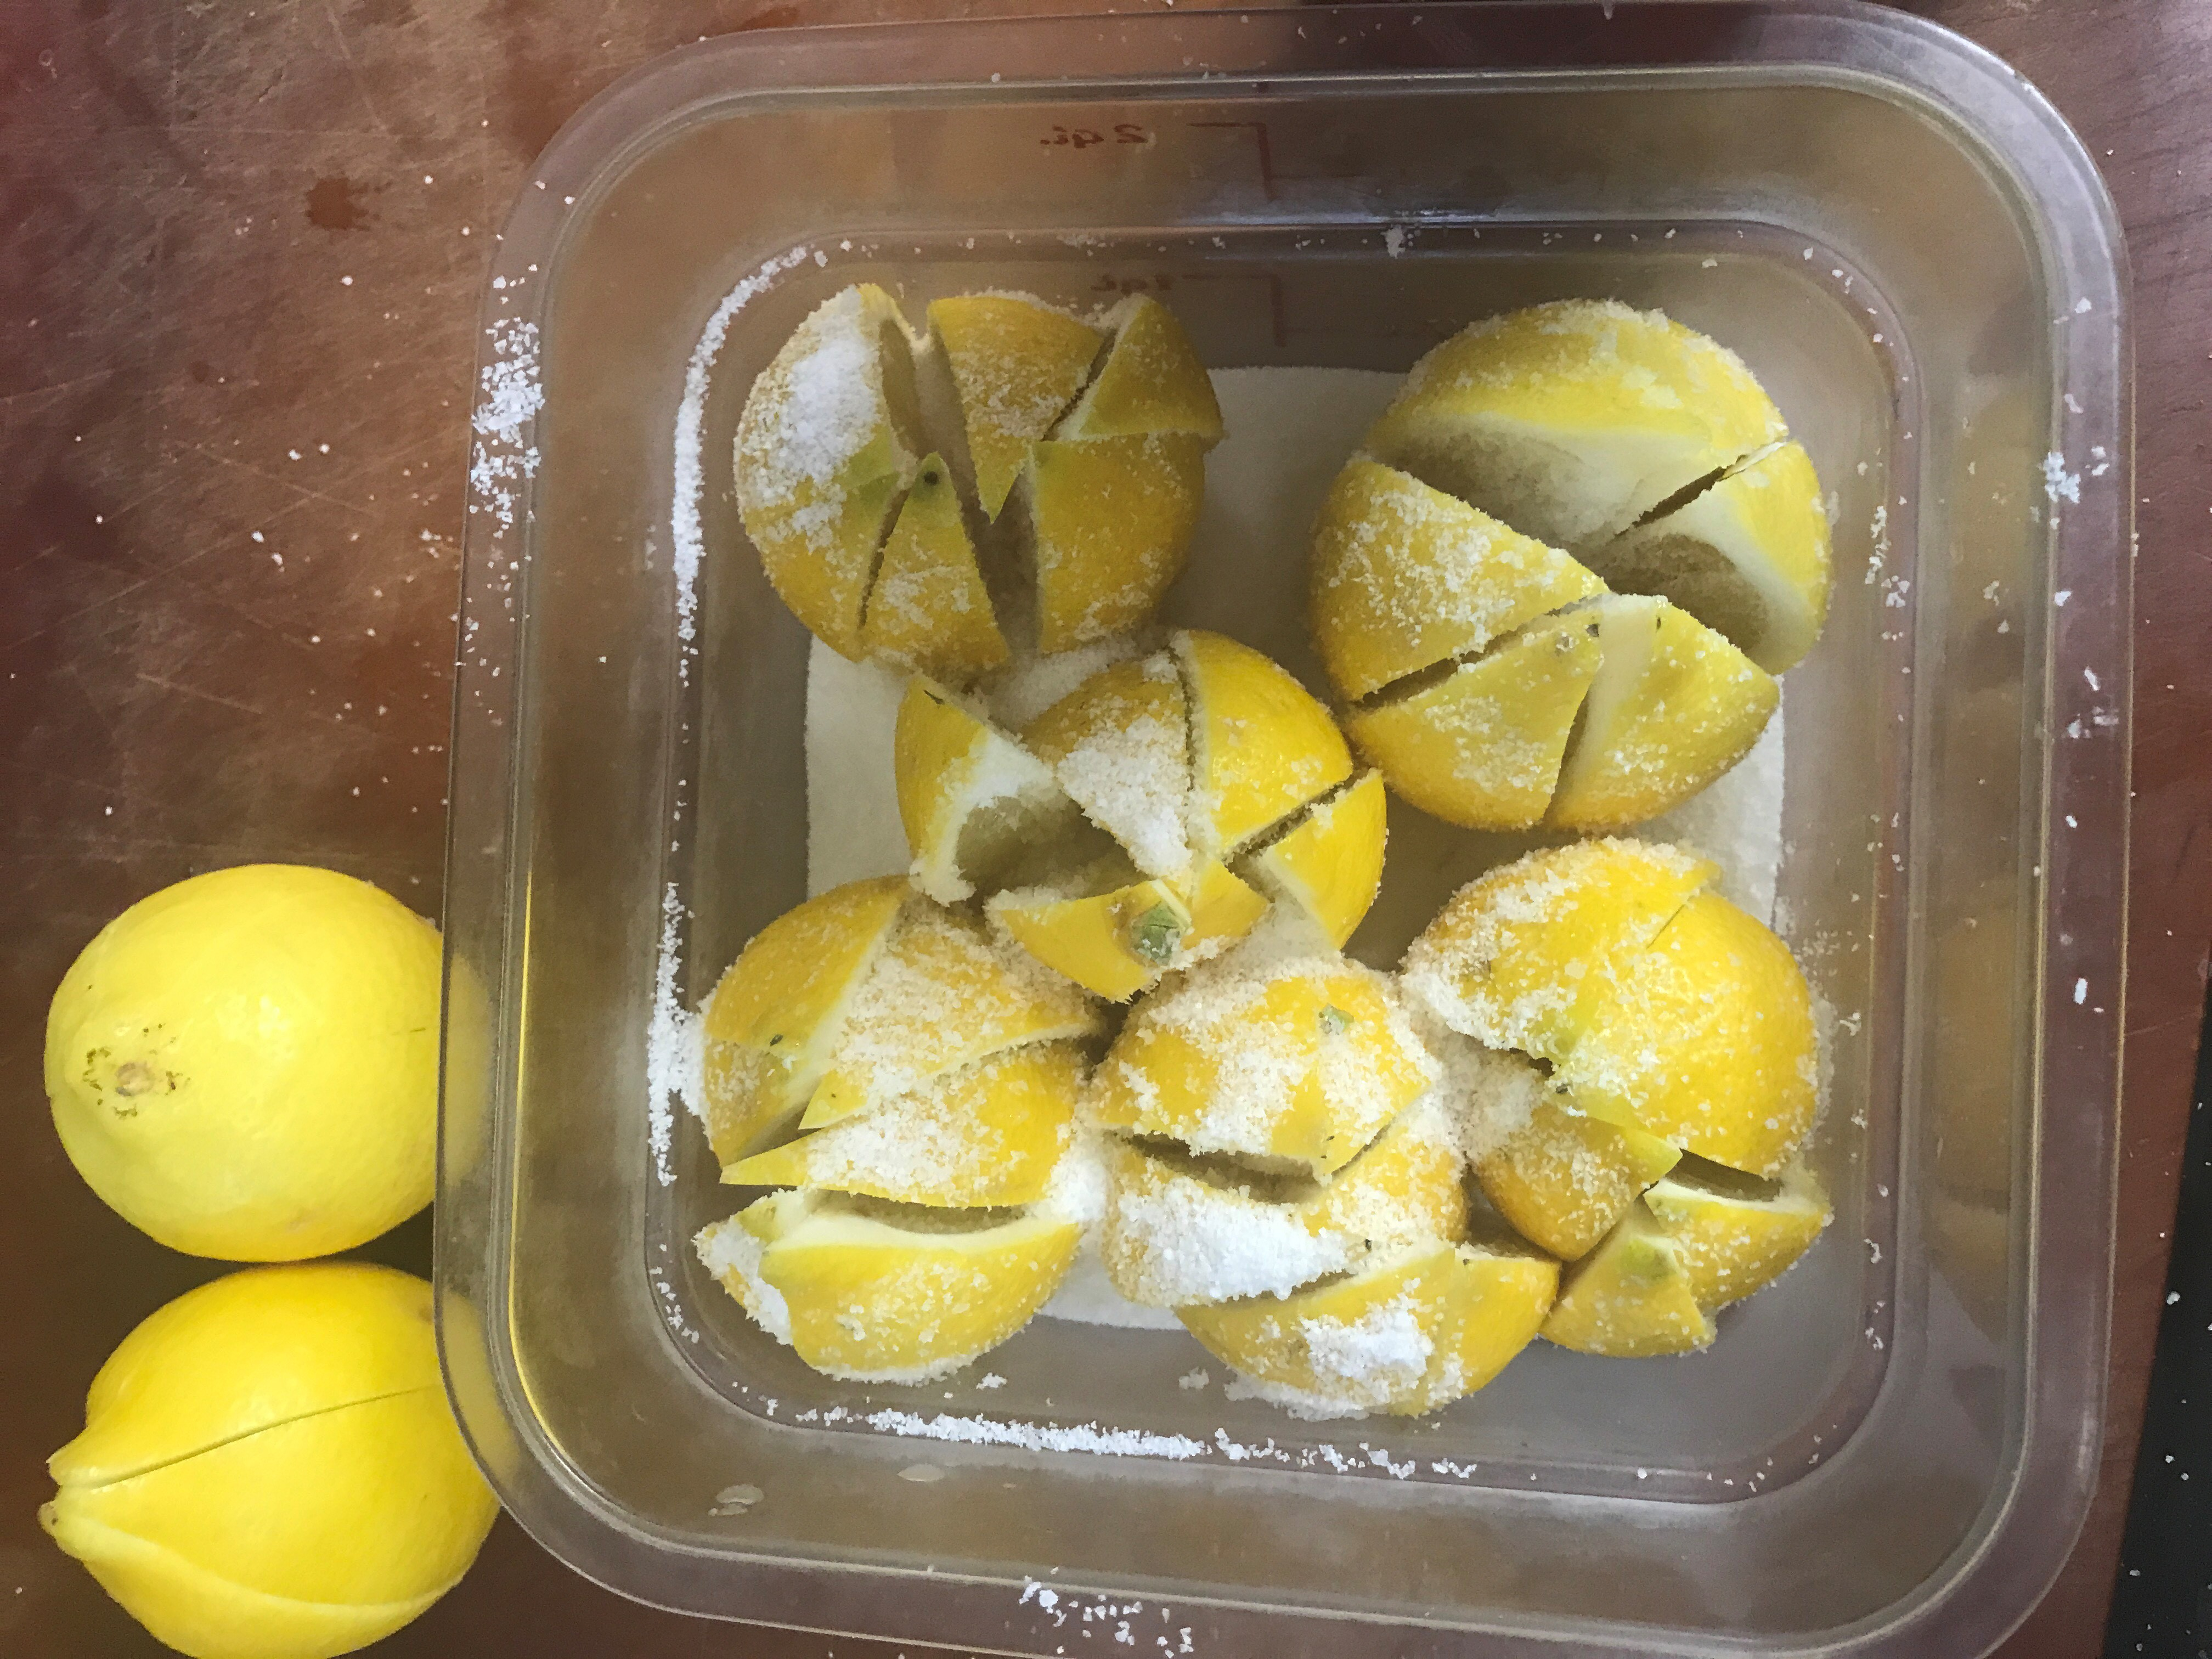 lemons tupperware